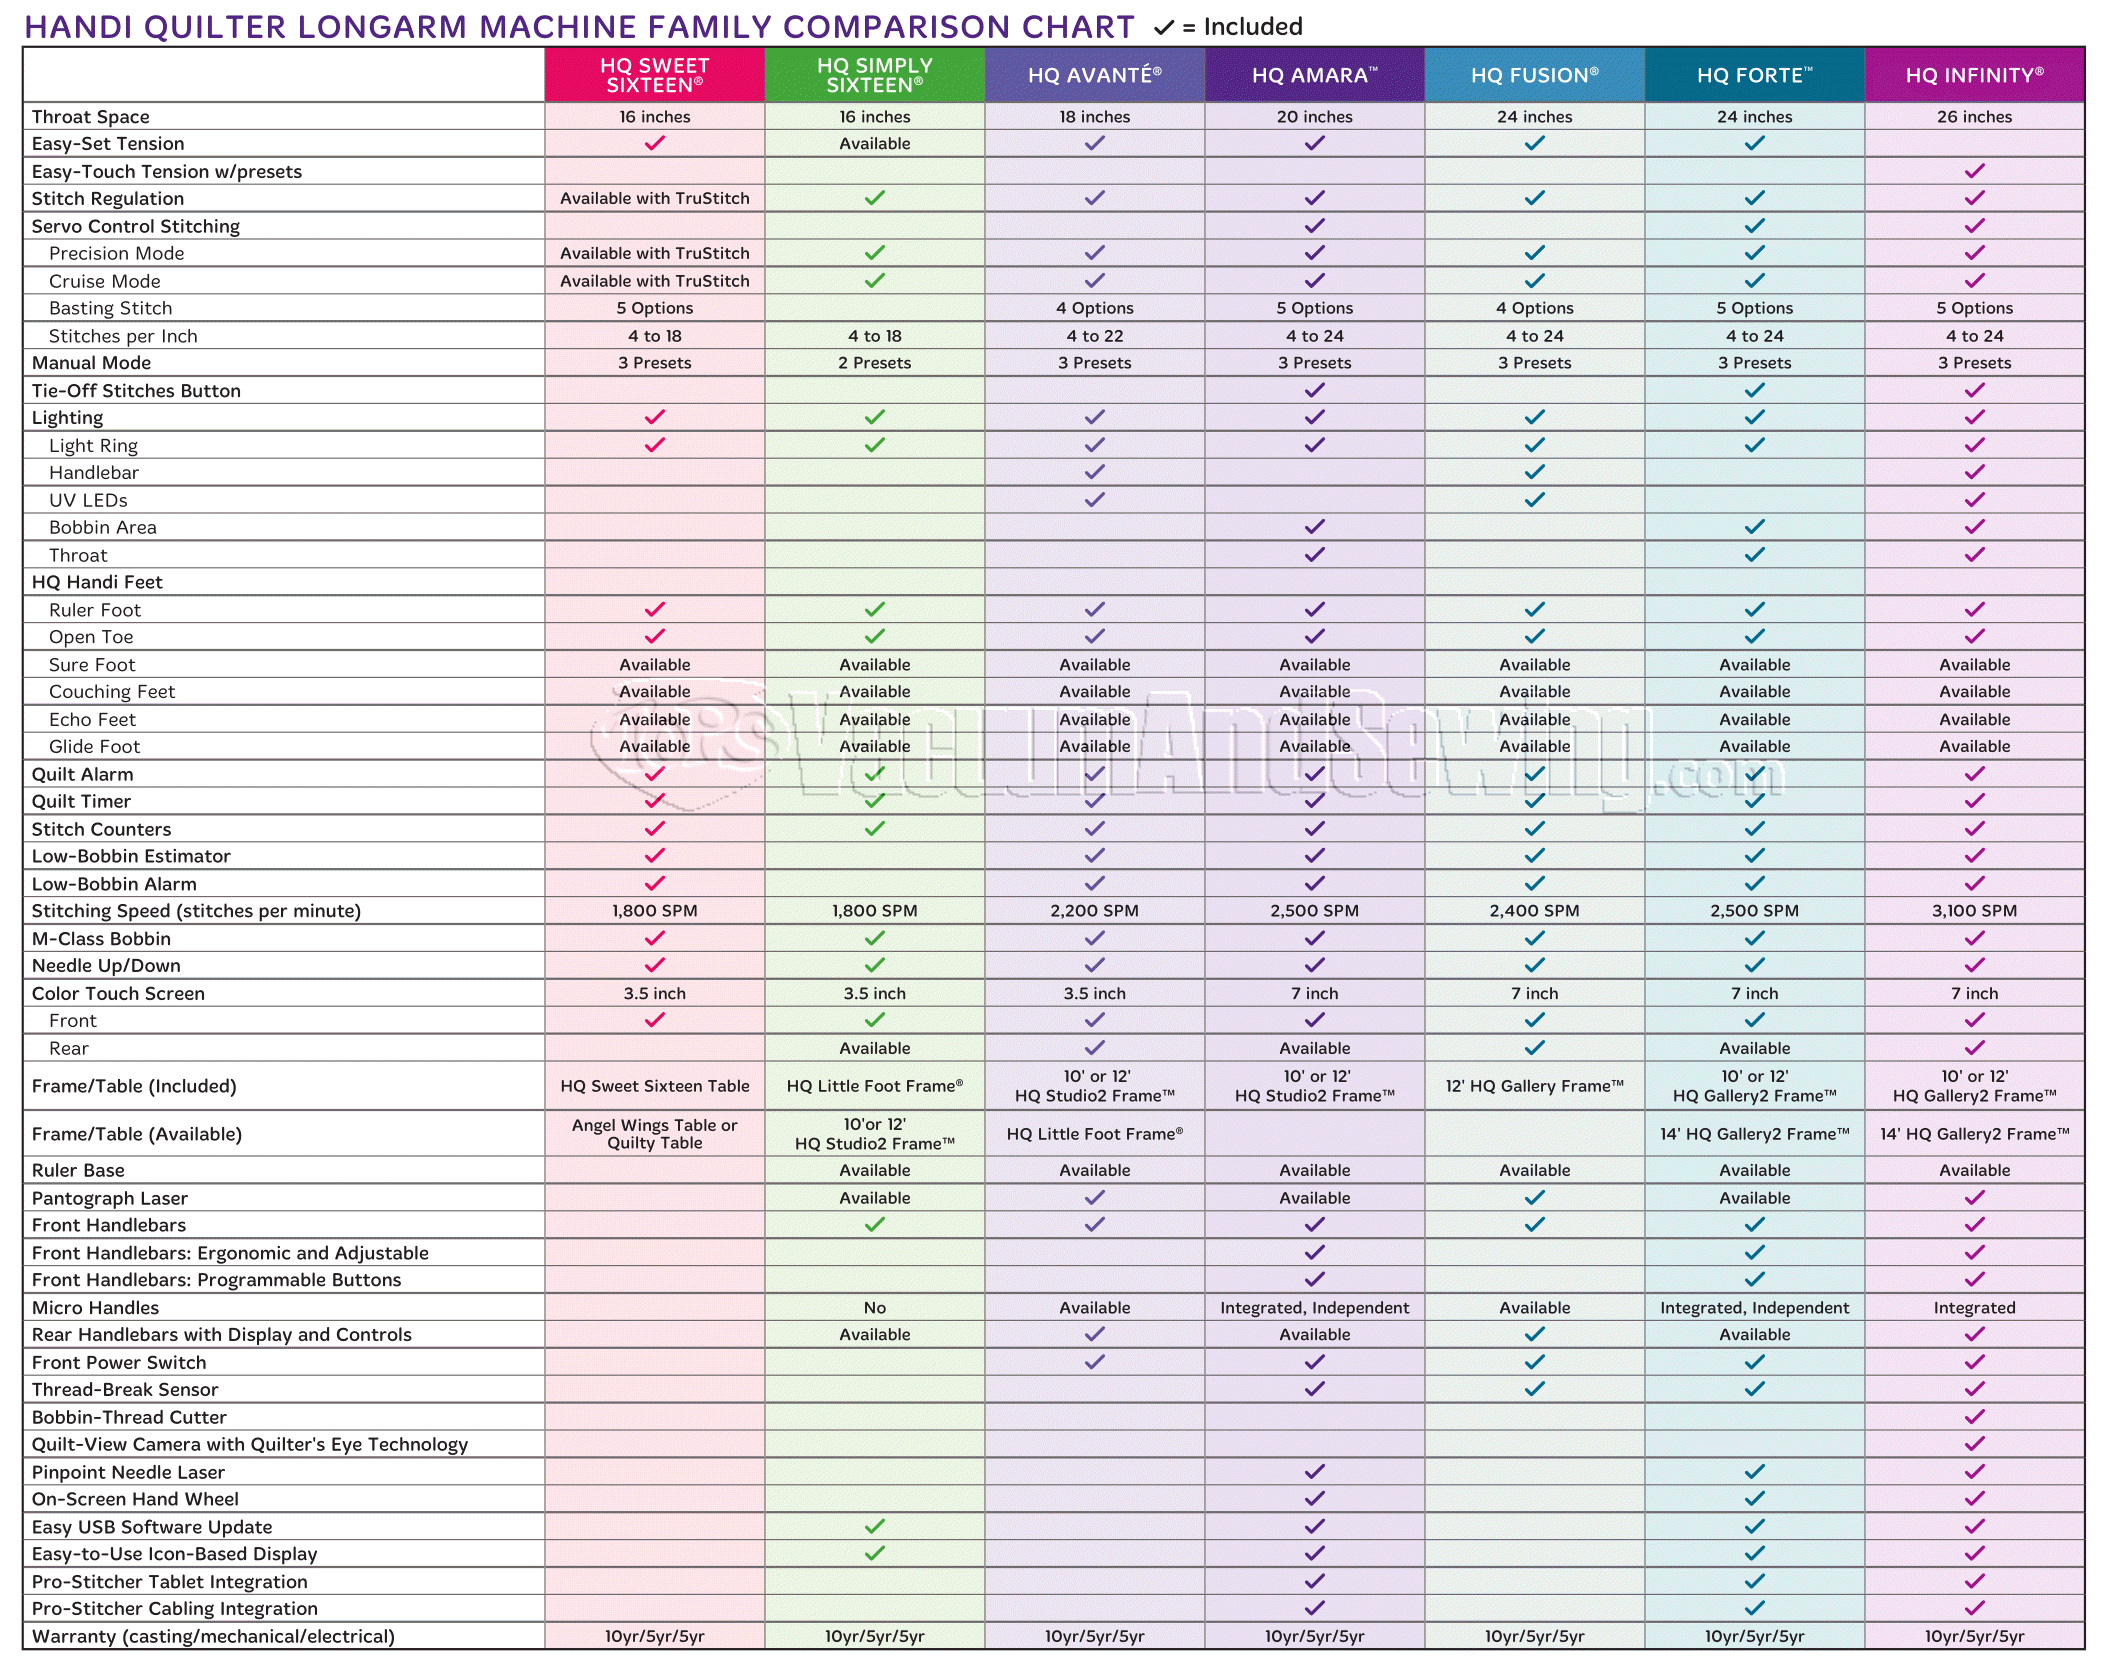 HQ Comparison Chart